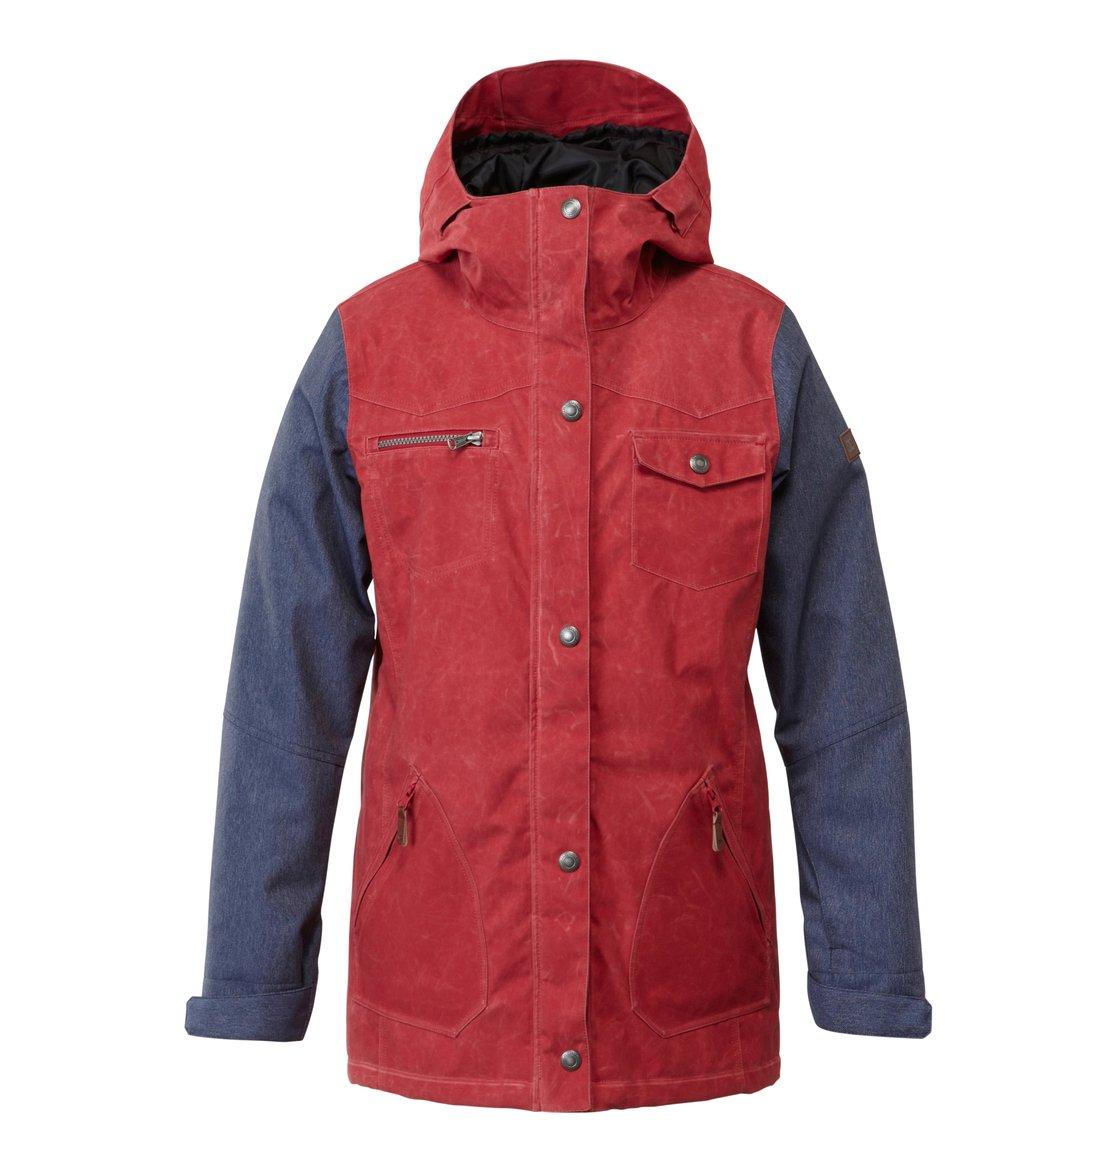 Купить Куртки для сноуборда   Falcon